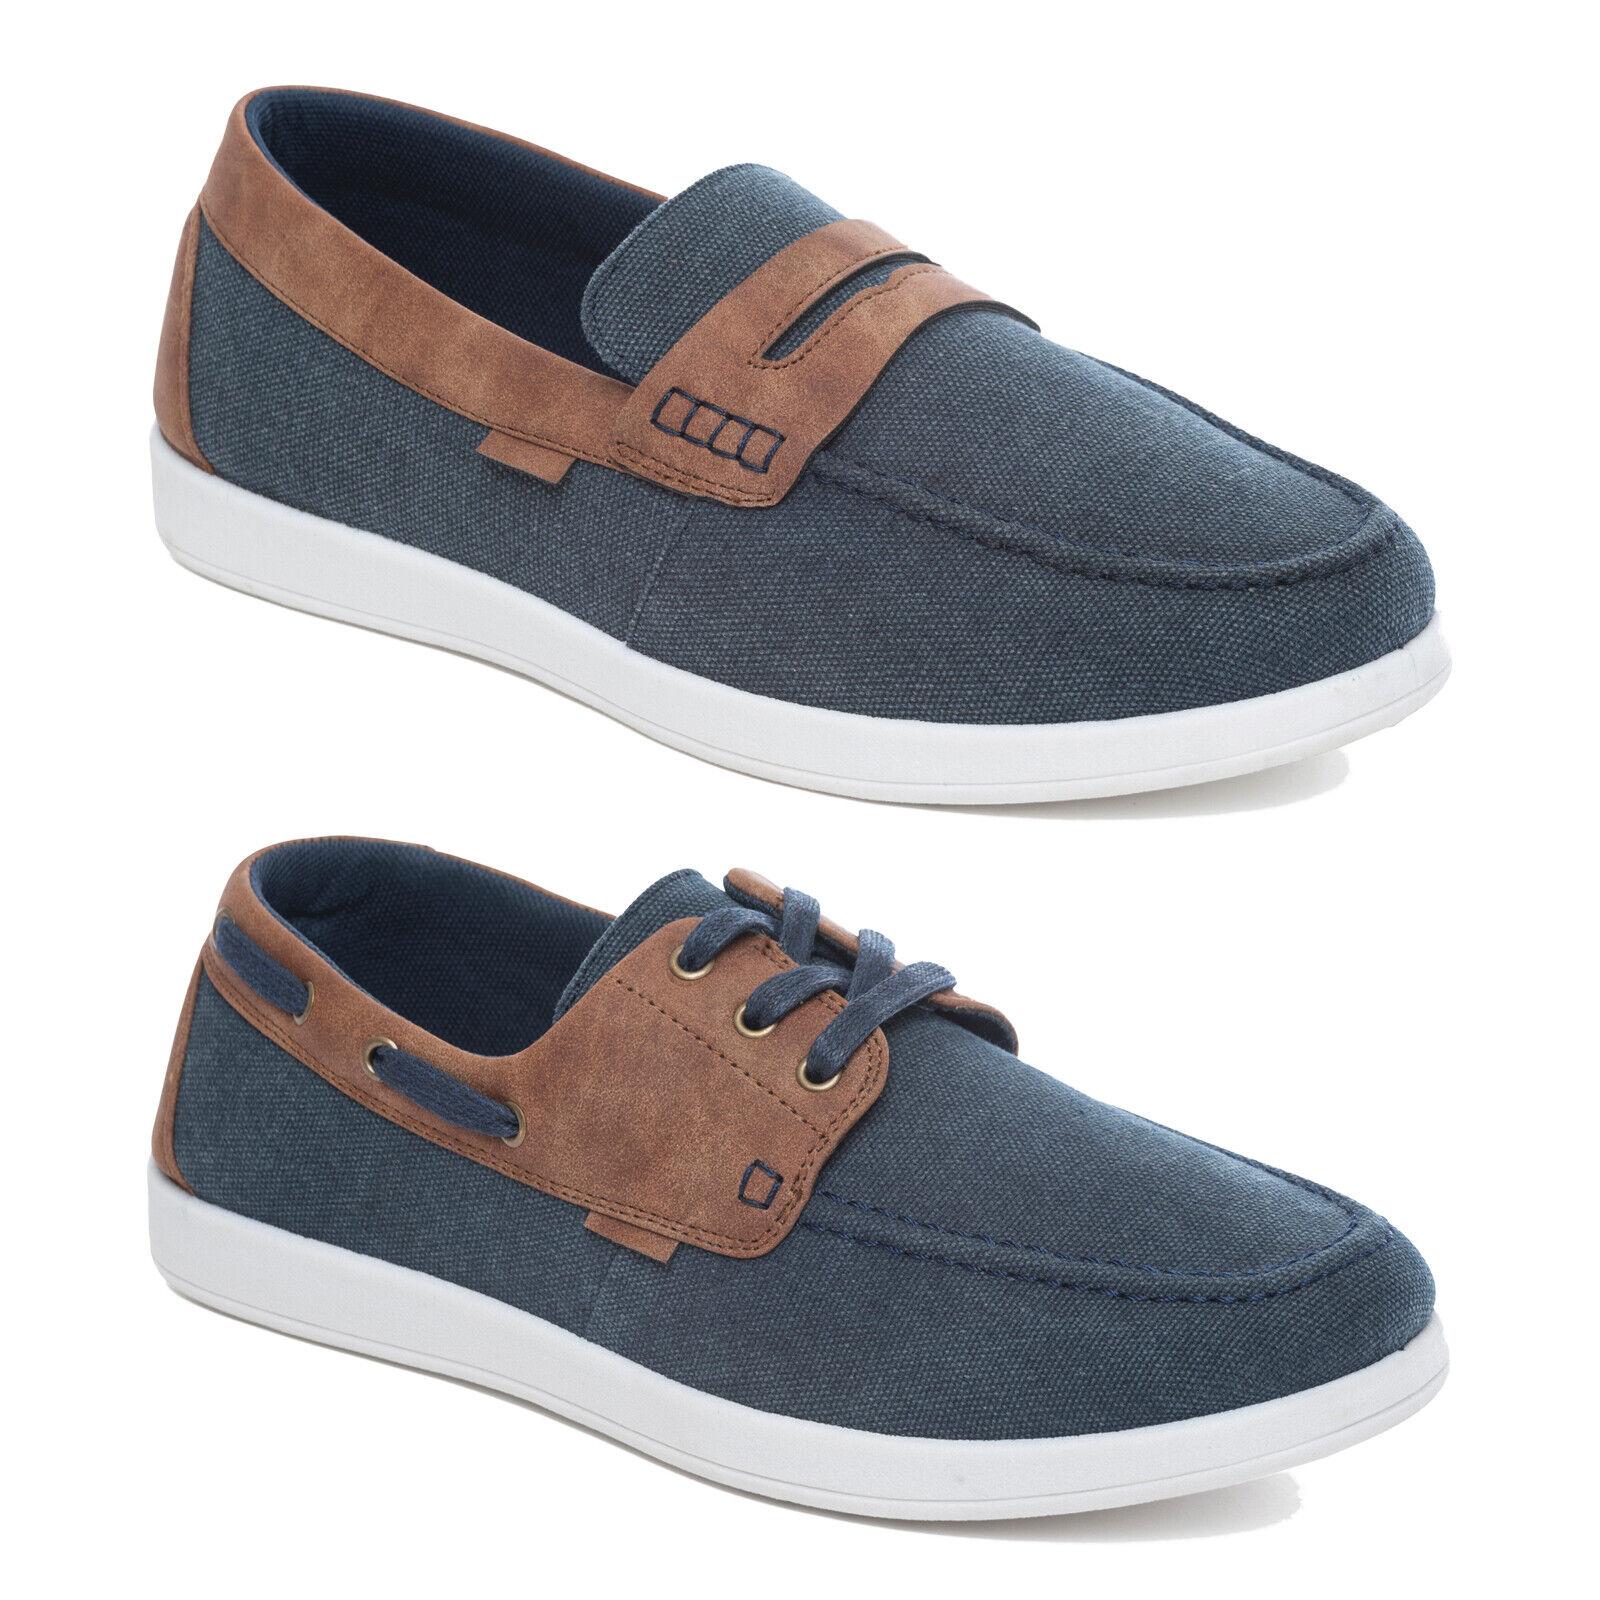 mens canvas boat shoes